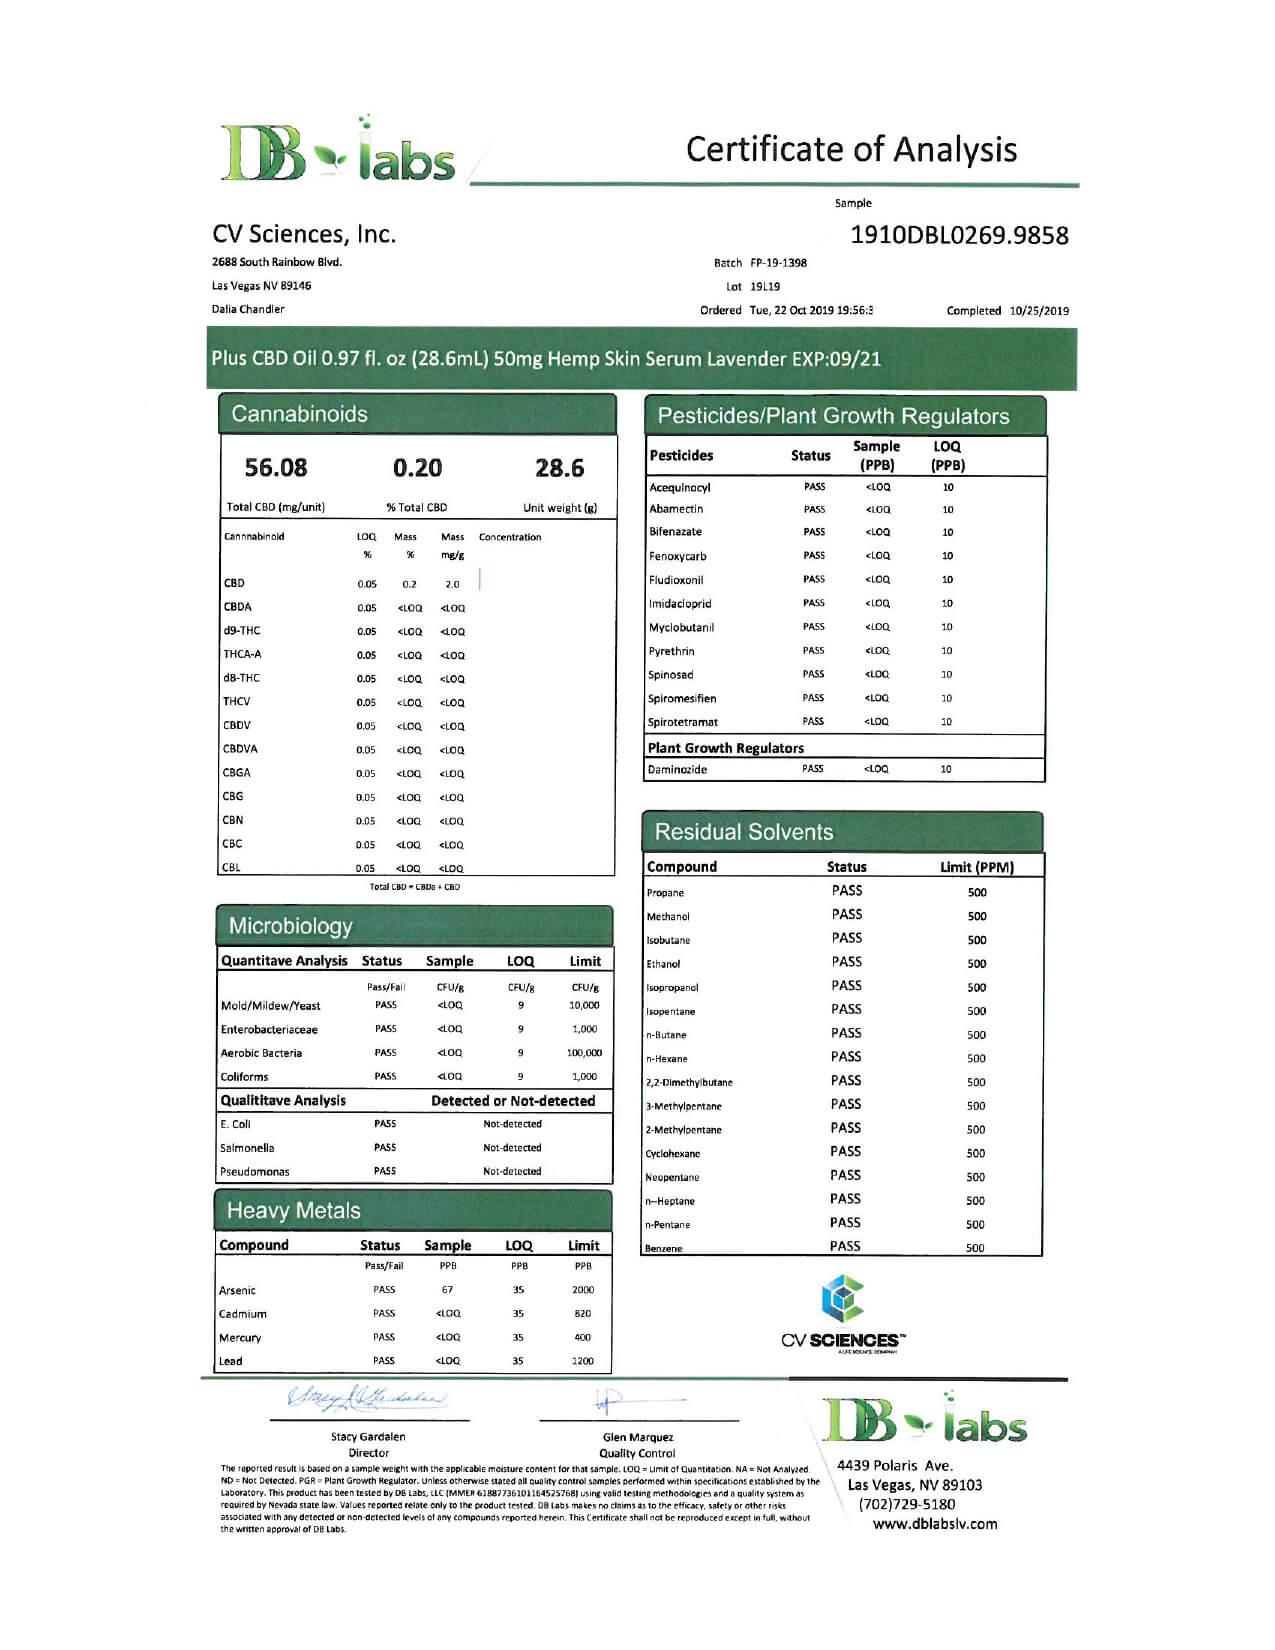 PlusCBD Oil CBD Topical Gold Skin Serum Lab Report